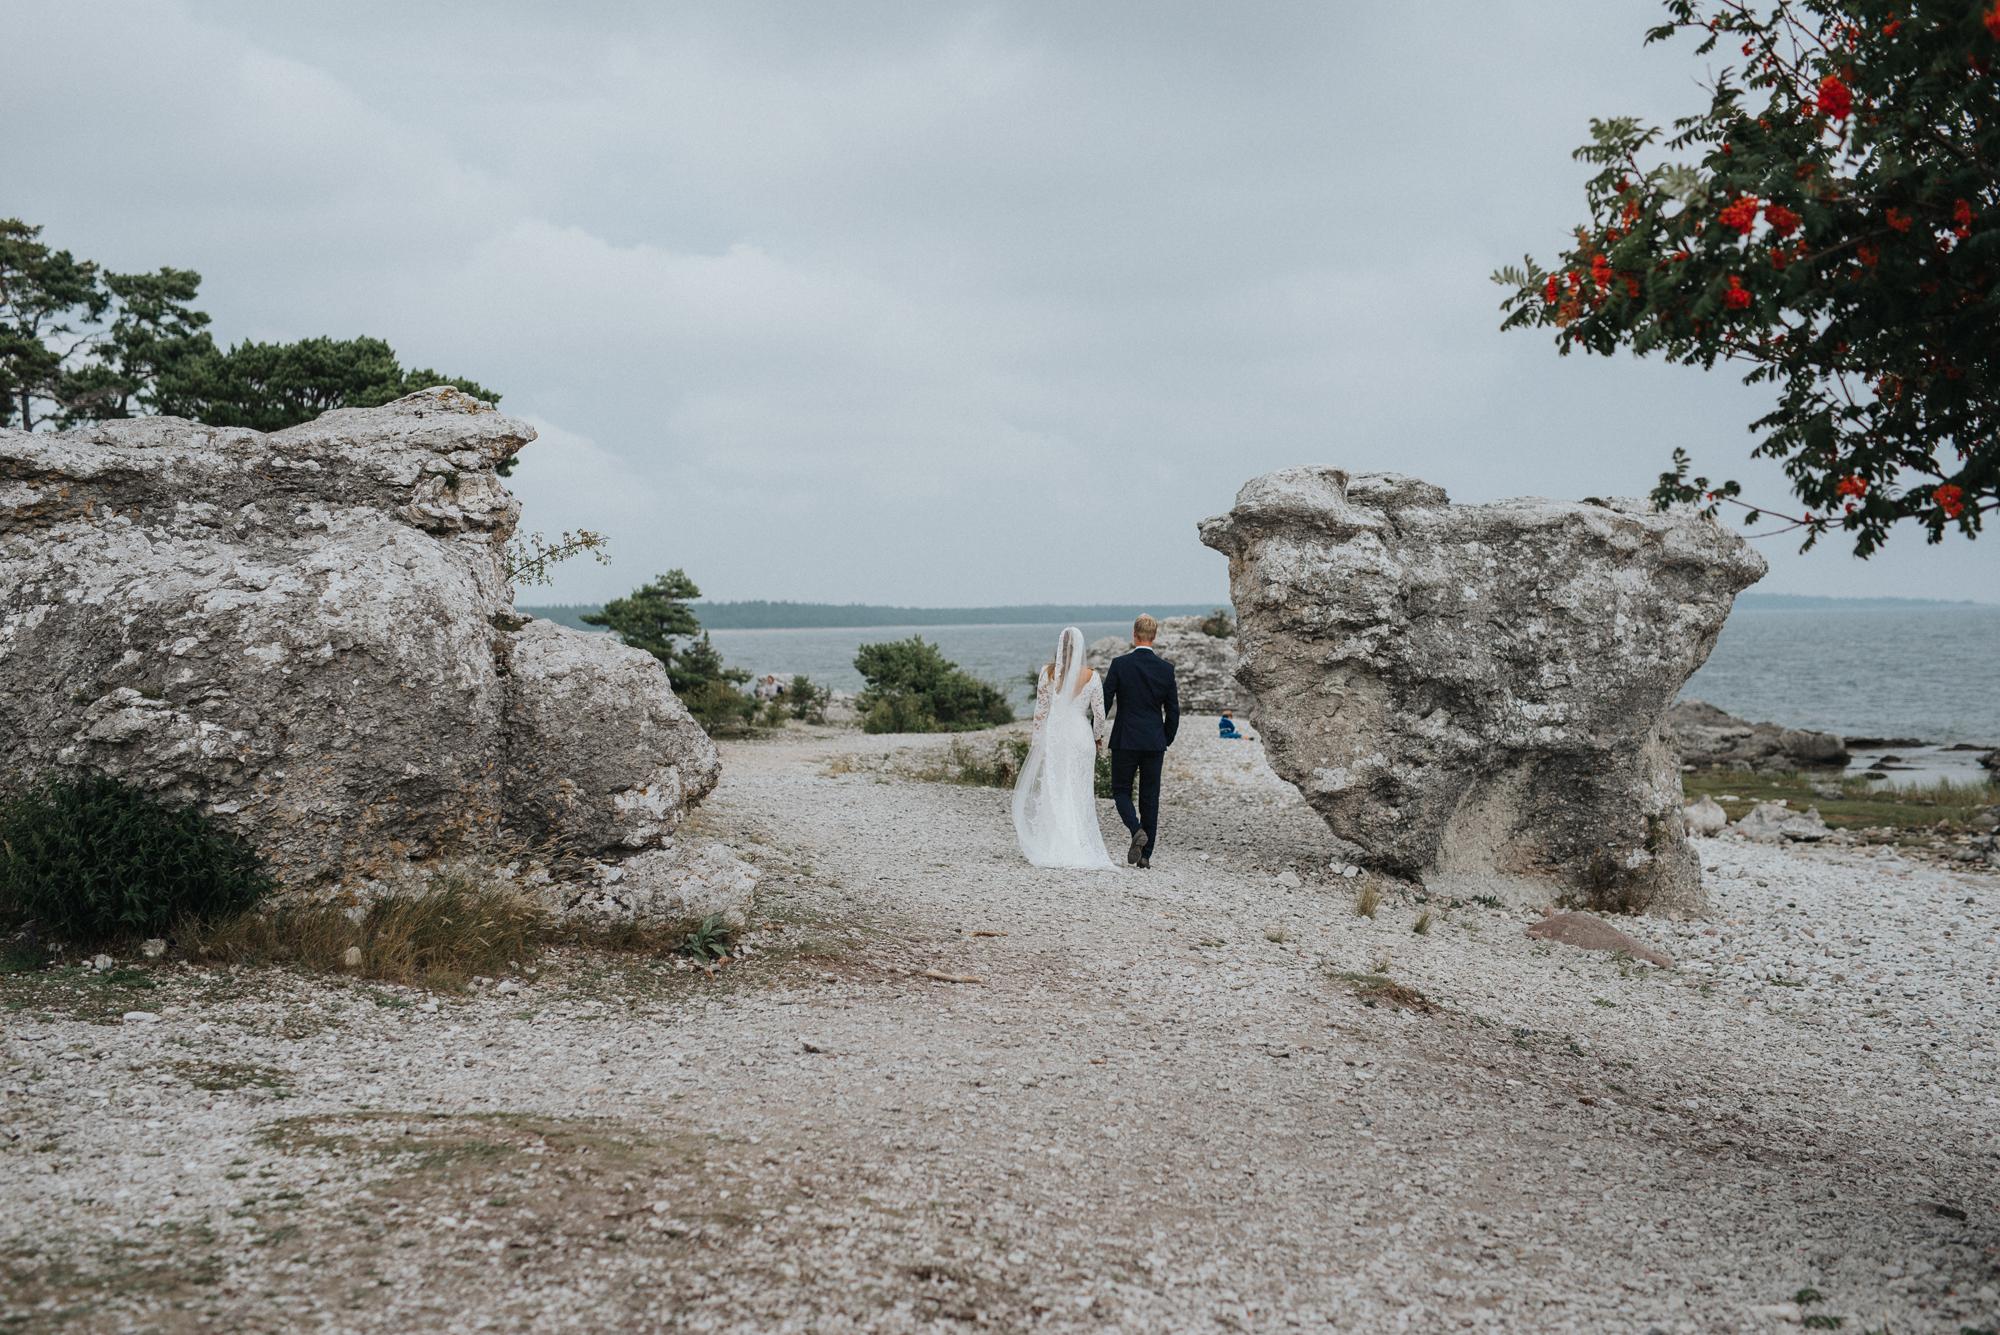 019-bröllopsfotograf-folhammar-gotland-neas-fotografi.jpg